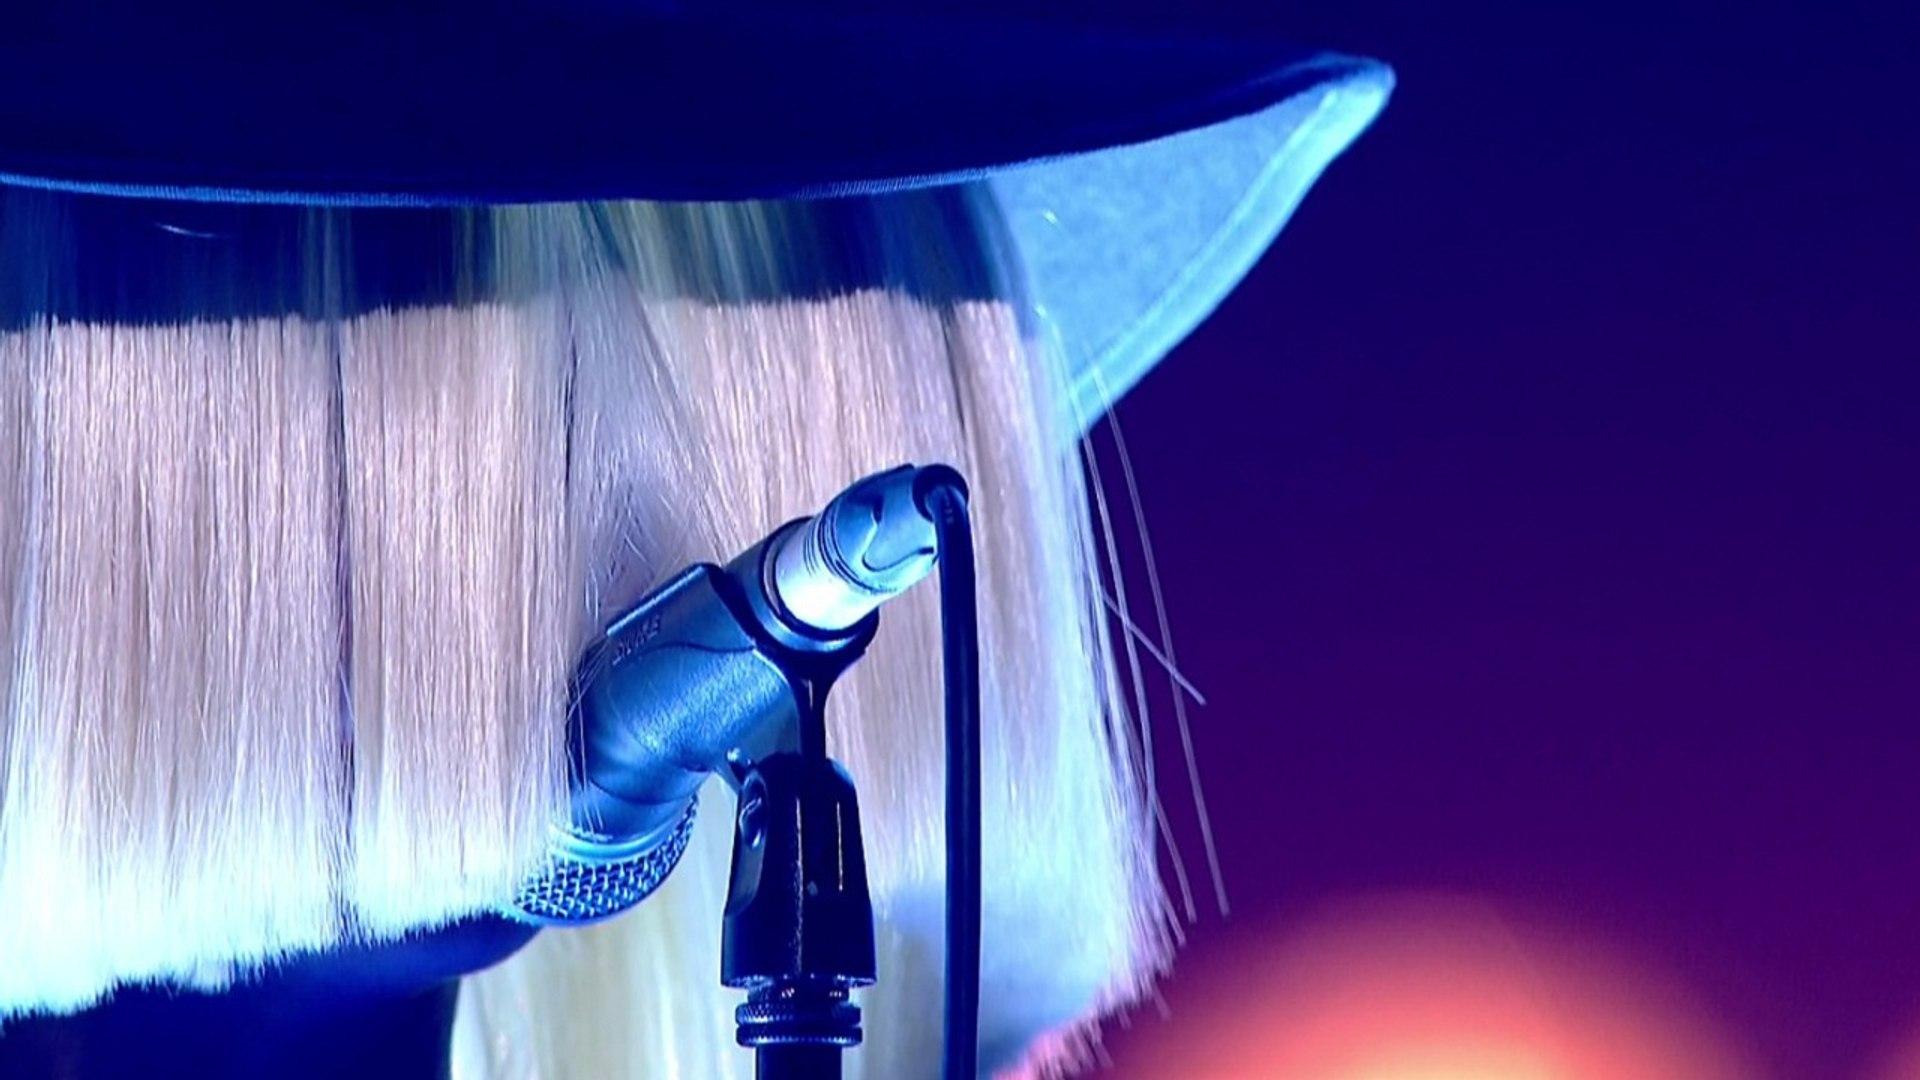 Sia, Zoe Saldana and Julianne Moore Team Up In 'Free Me' Music Video